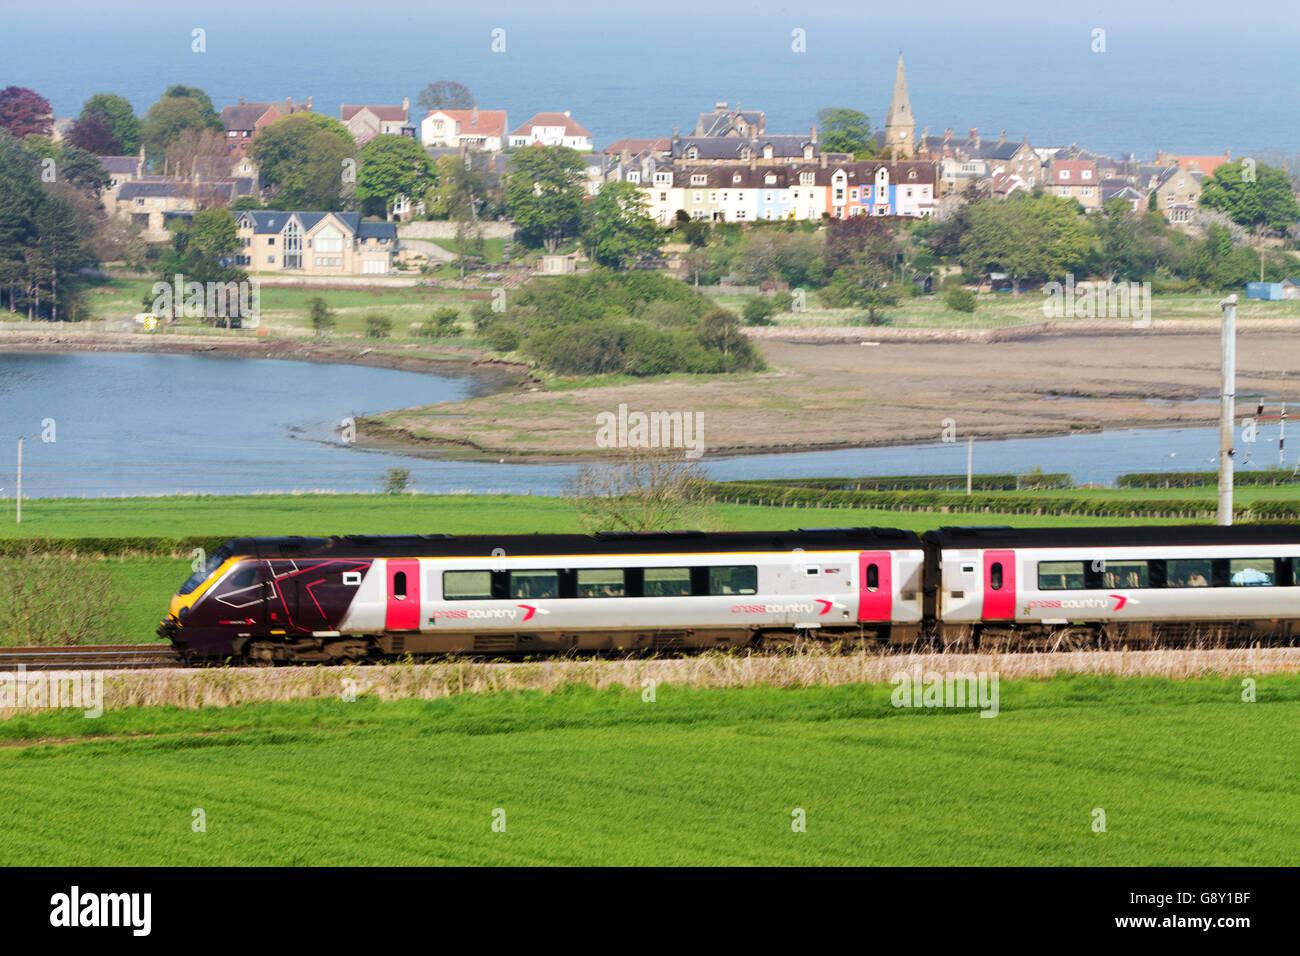 Railway stock - Stock Image